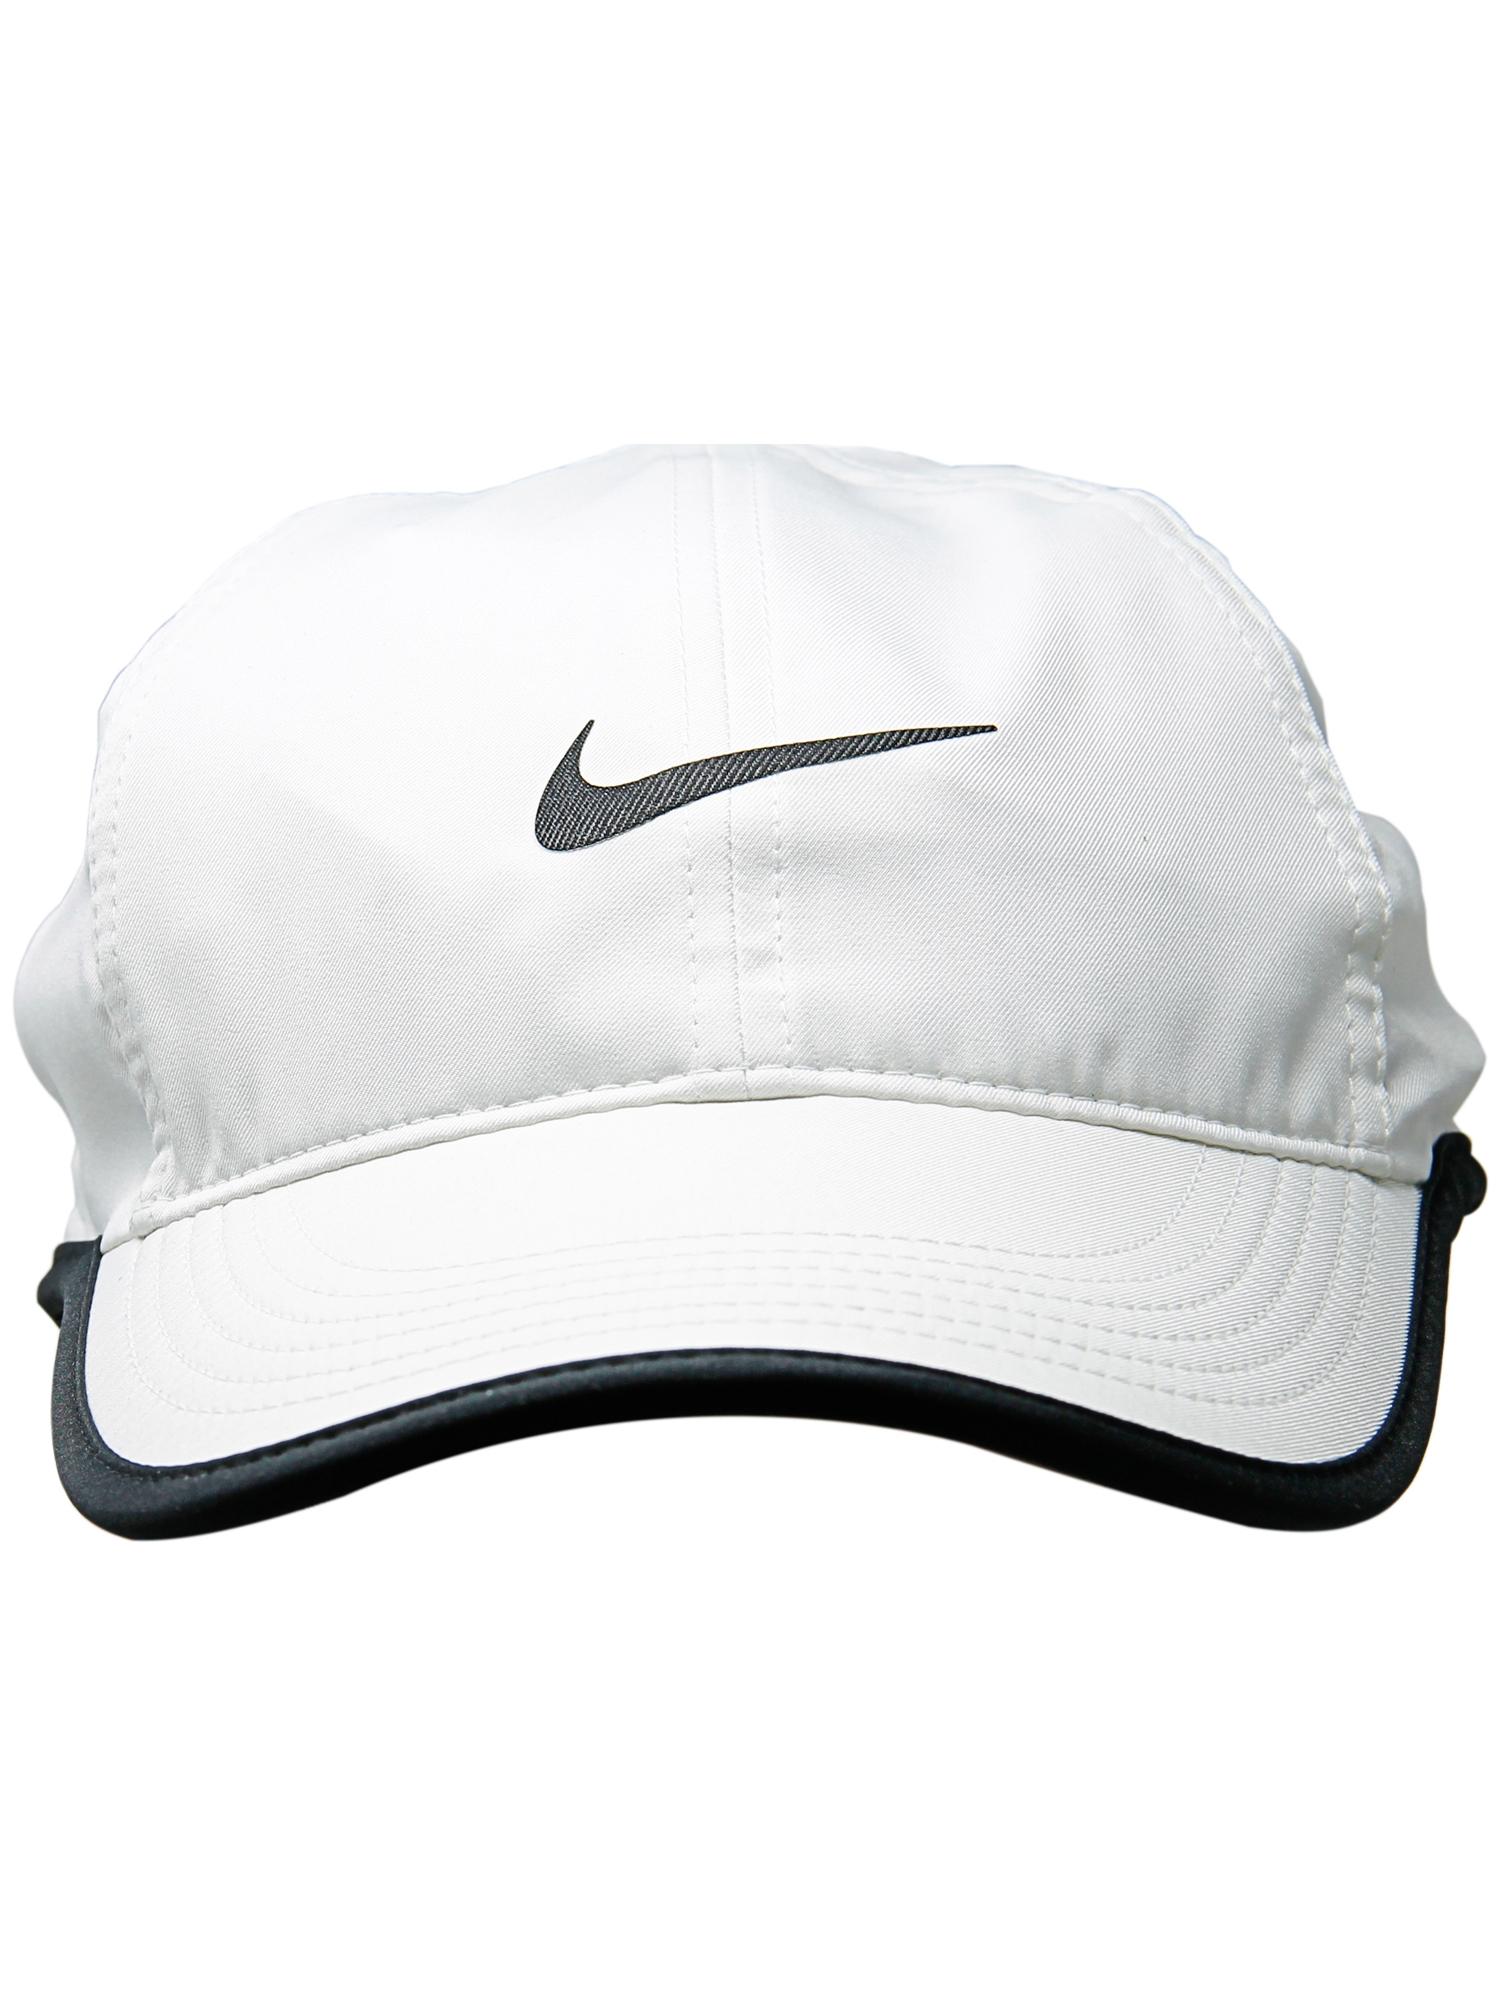 Nike Women s White   Black Aerobill Featherlight Tennis Cap Hat ... 75c76773640